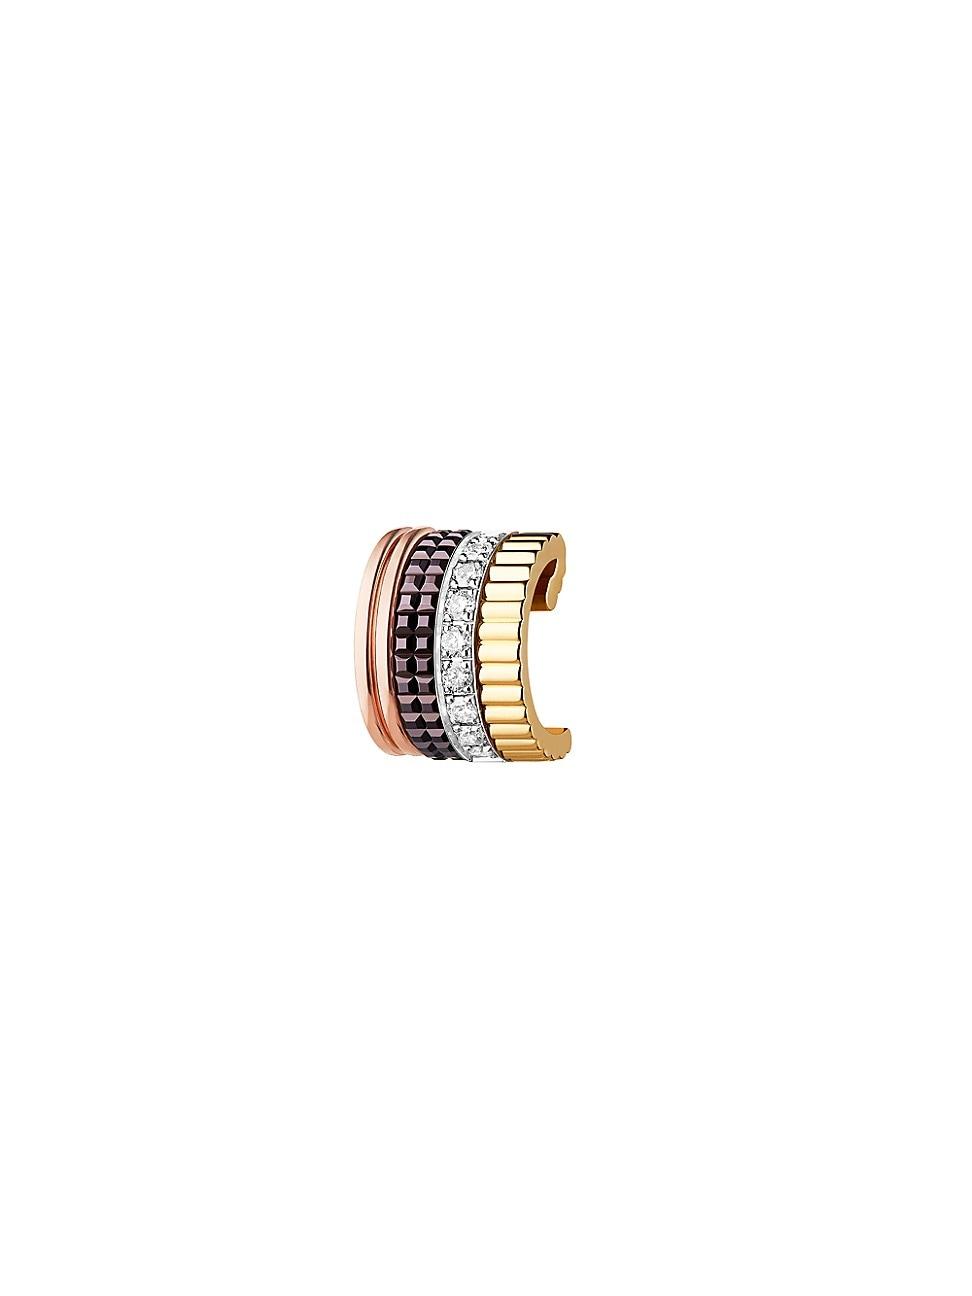 Boucheron WOMEN'S QUATRE CLASSIQUE 18K TRI-TONE GOLD, DIAMOND & BROWN PVD SINGLE EAR CUFF